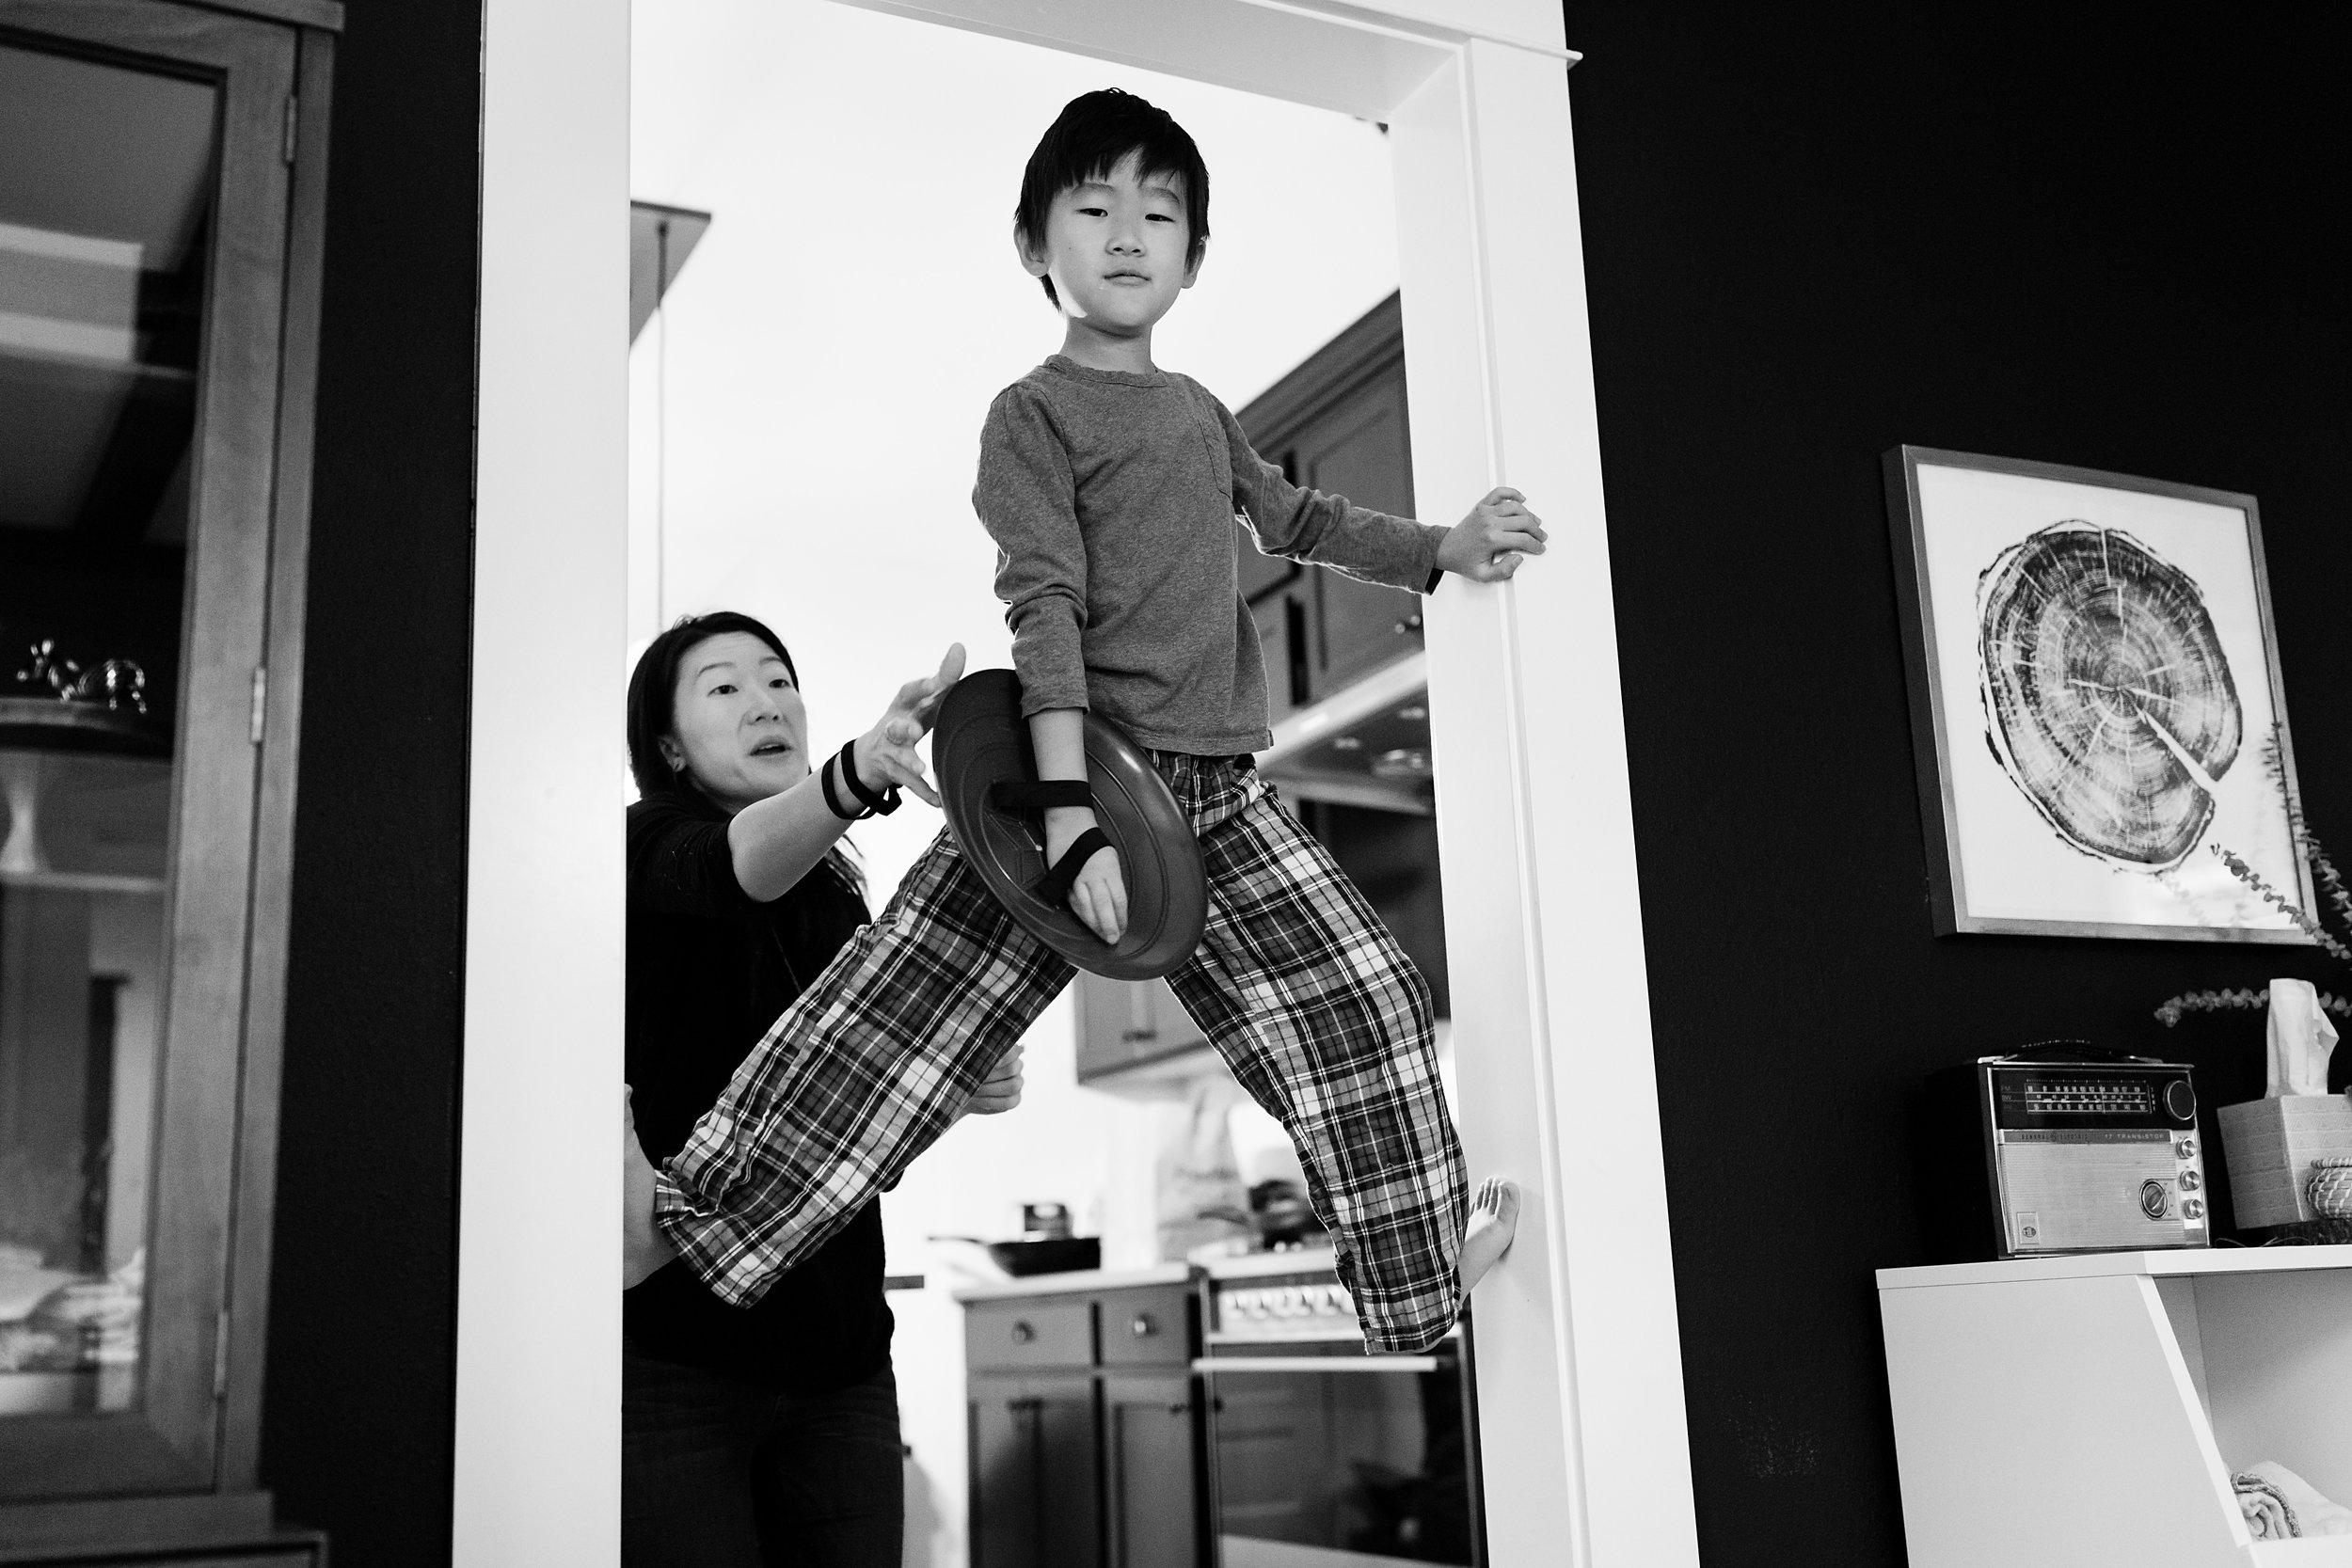 boy suspending in door frame while mom looks on